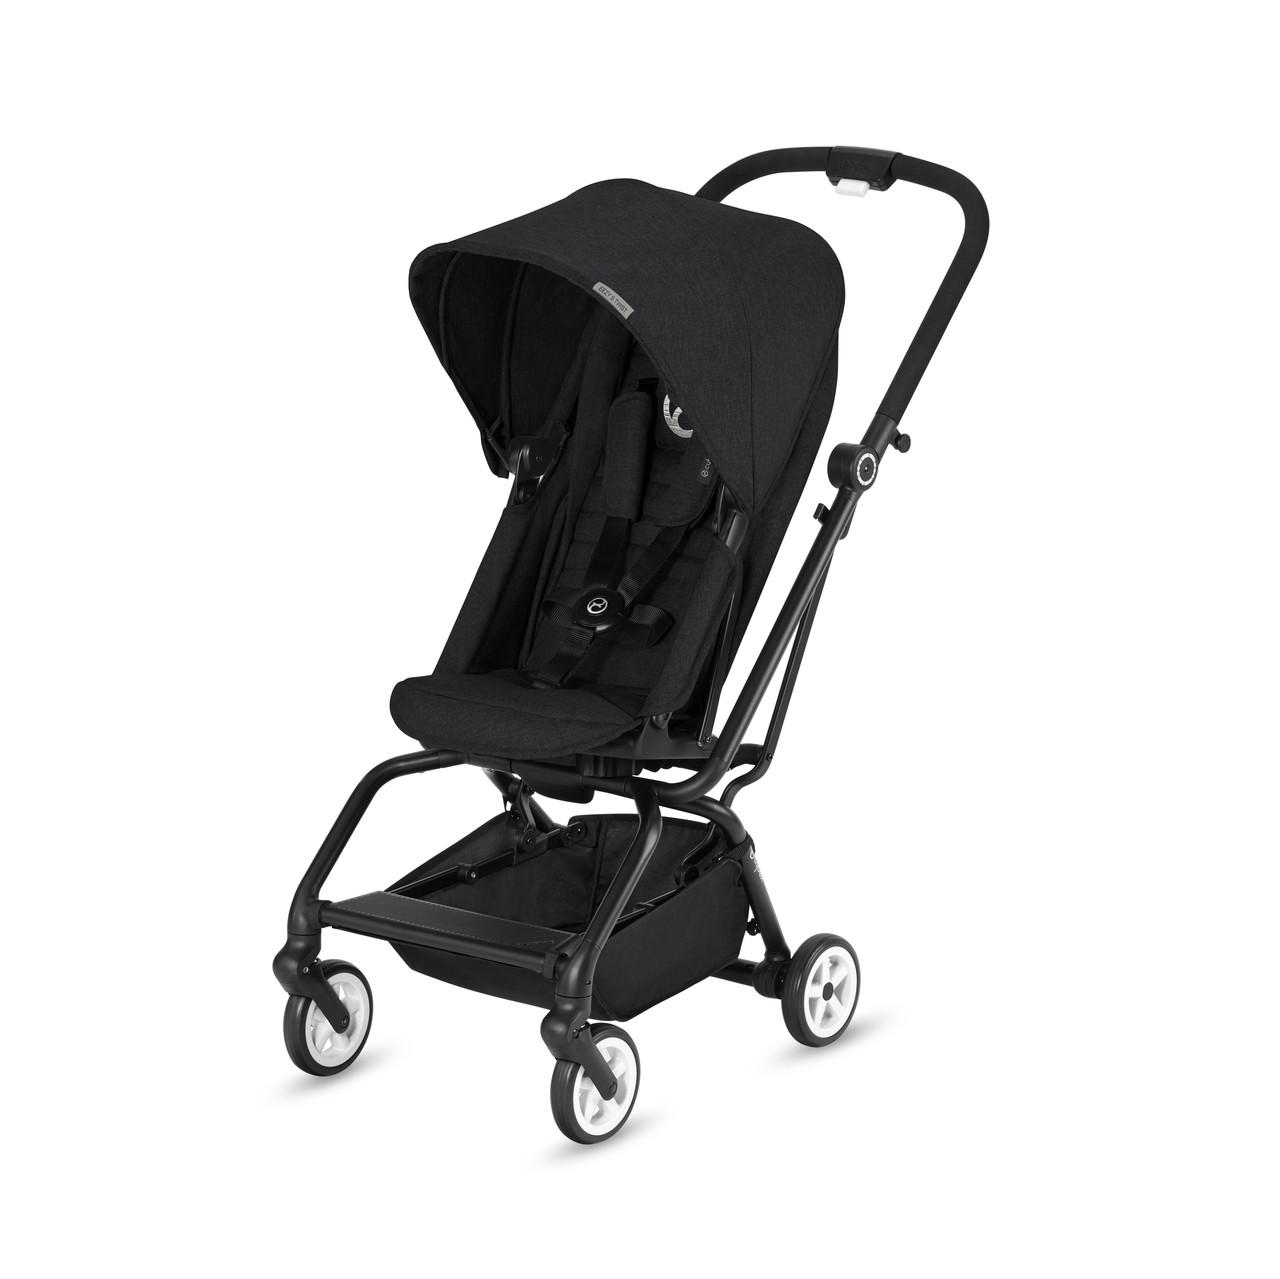 Cybex - Прогулочная коляска Eezy S Twist, цвет Lavastone Black